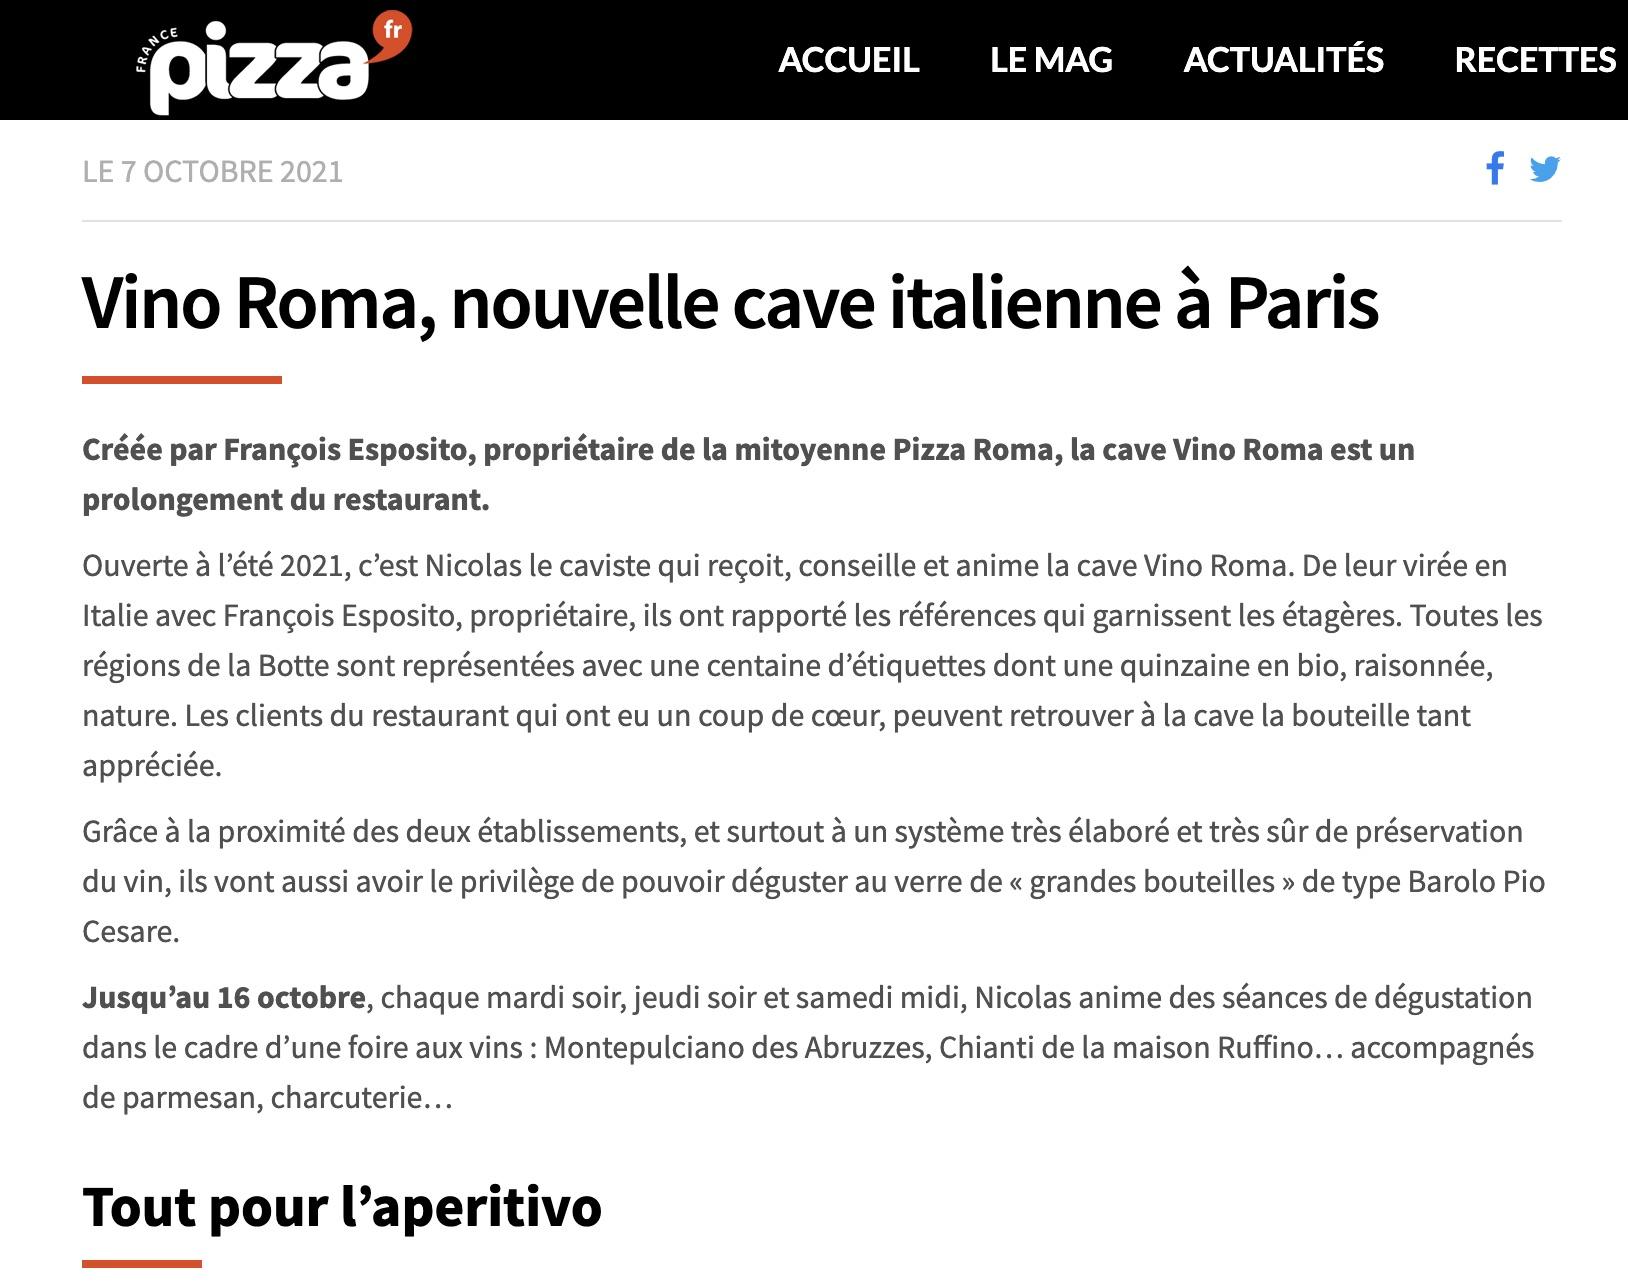 Vino Roma article